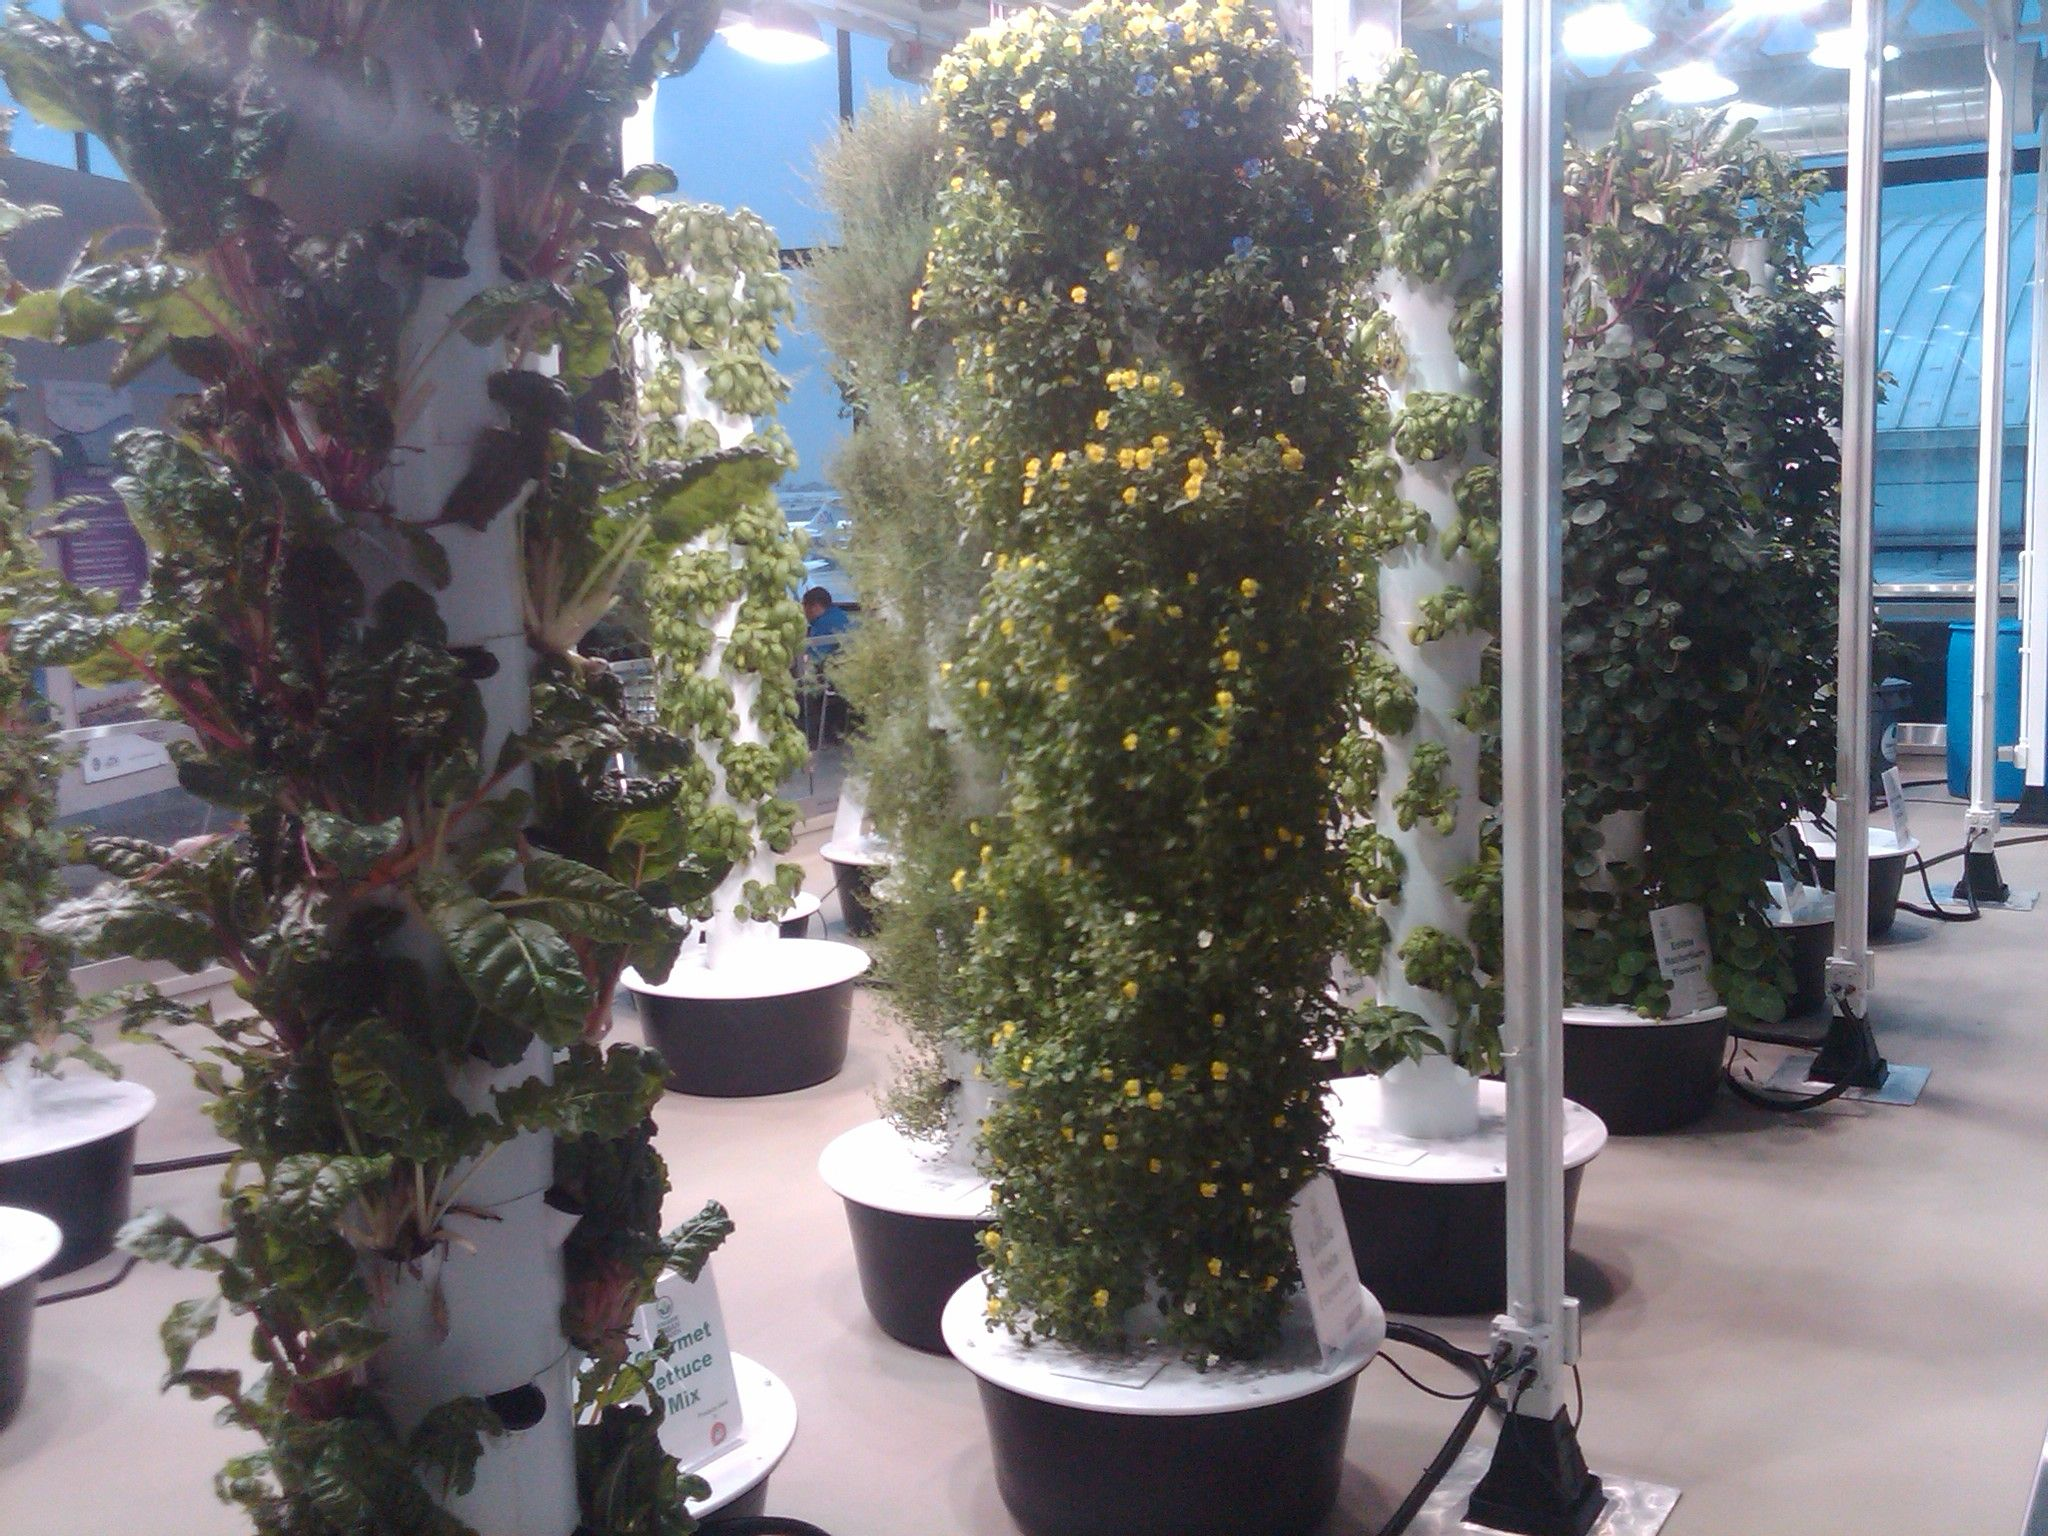 Vertical Vegetable Gardens What A Cool Idea Gardening Pinterest Vertical Vegetable